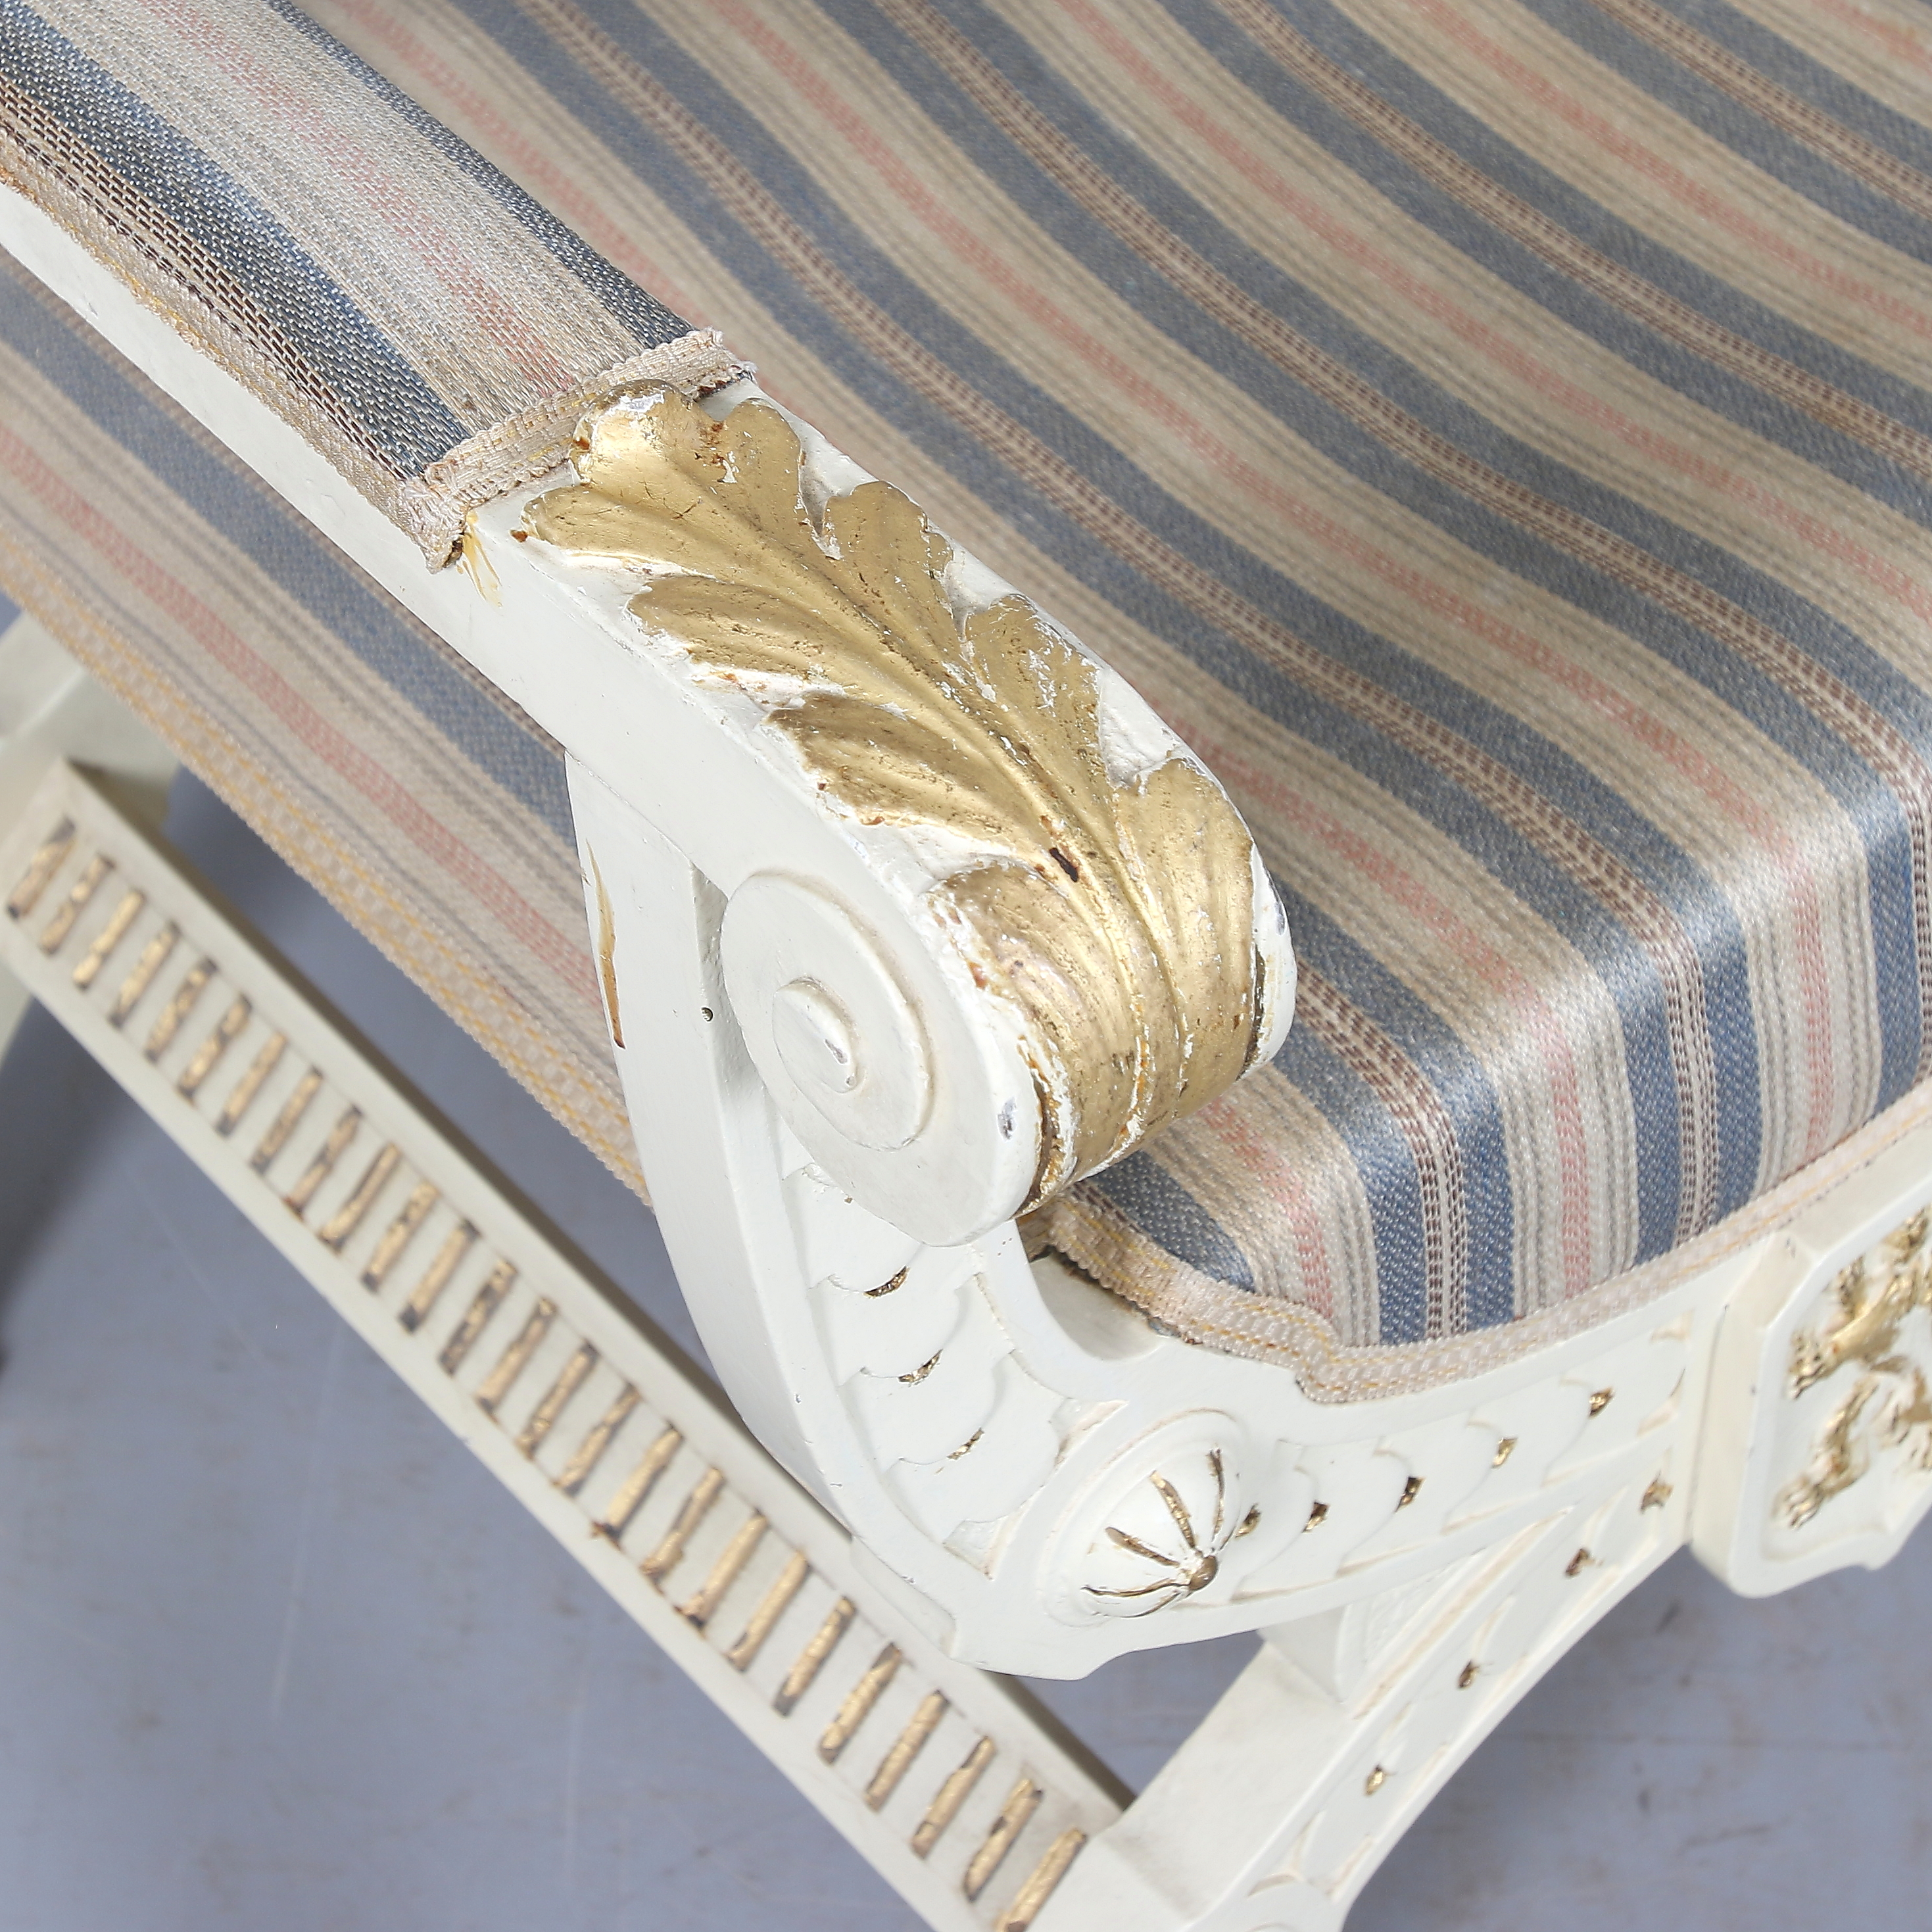 dantestol auktion ~ images for 280316 dantestol samt brudpall, gustaviansk